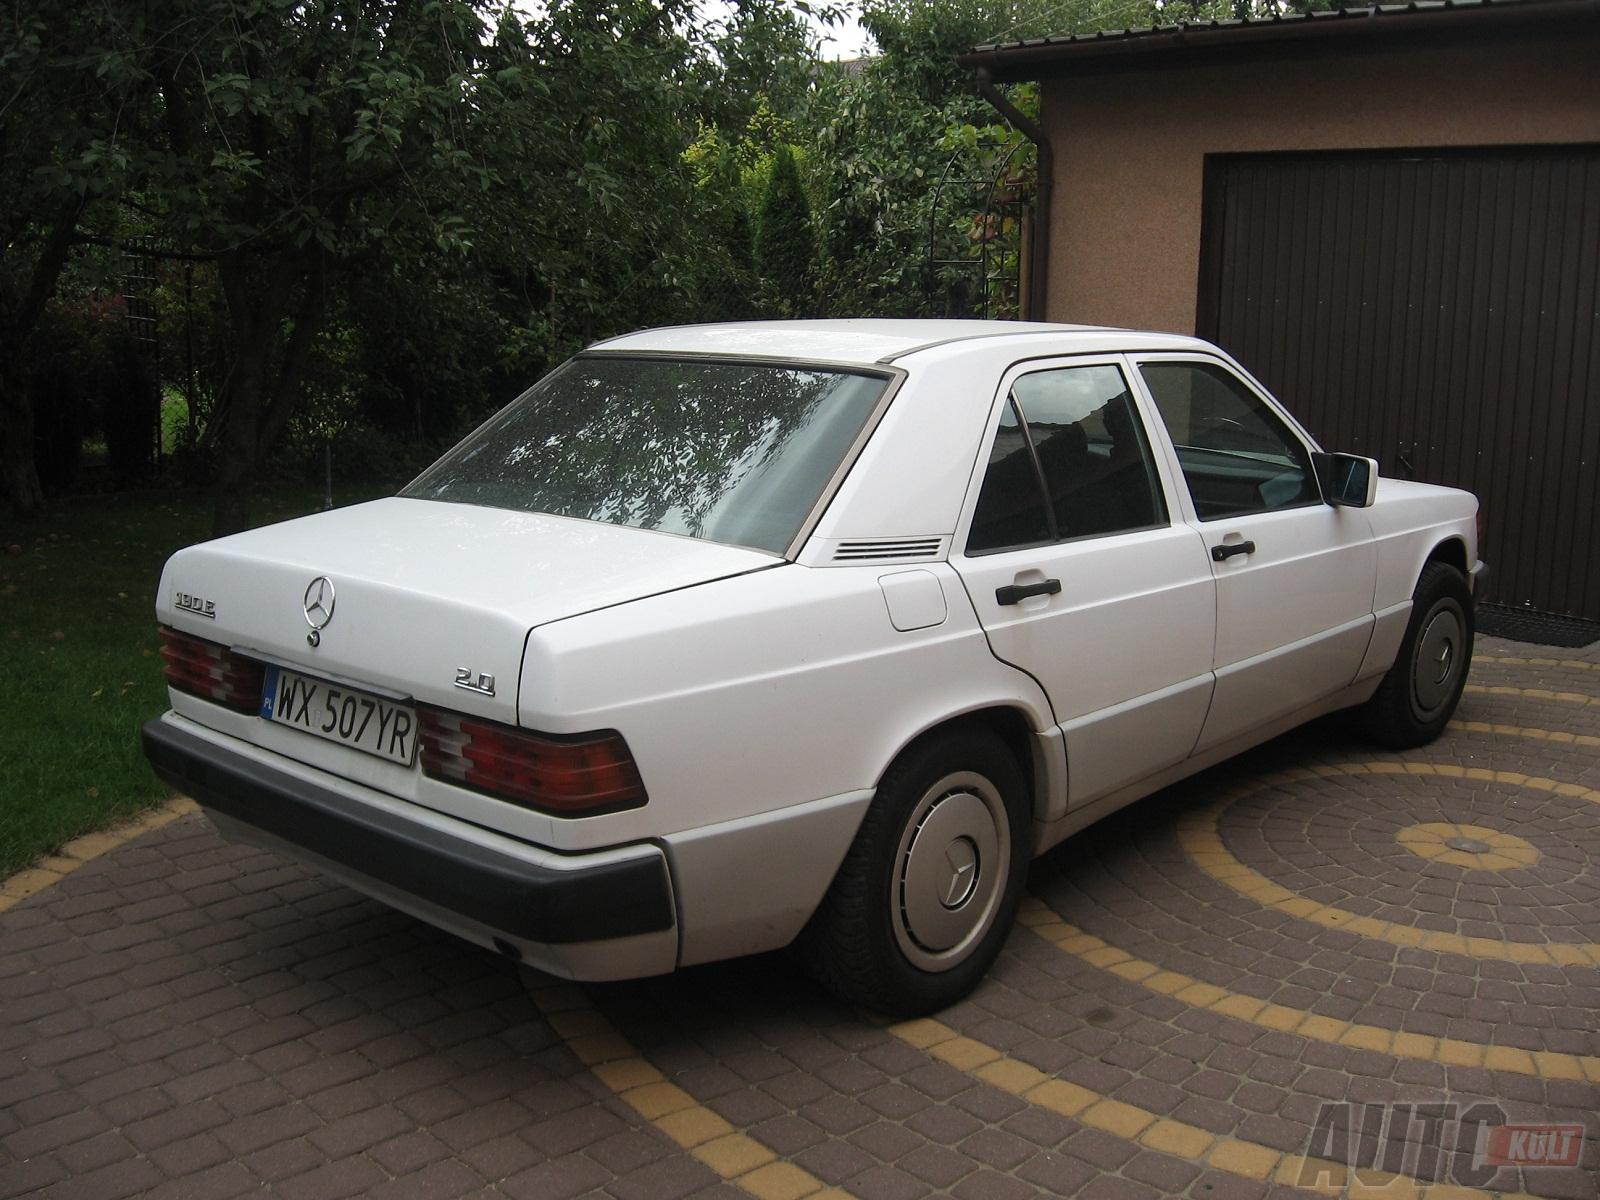 http://s2.blomedia.pl/autokult.pl/images/2012/11/Jazda-Youngtimerem-cz.6-naprawy-Mercedesa-190-W201-8-260952.jpg